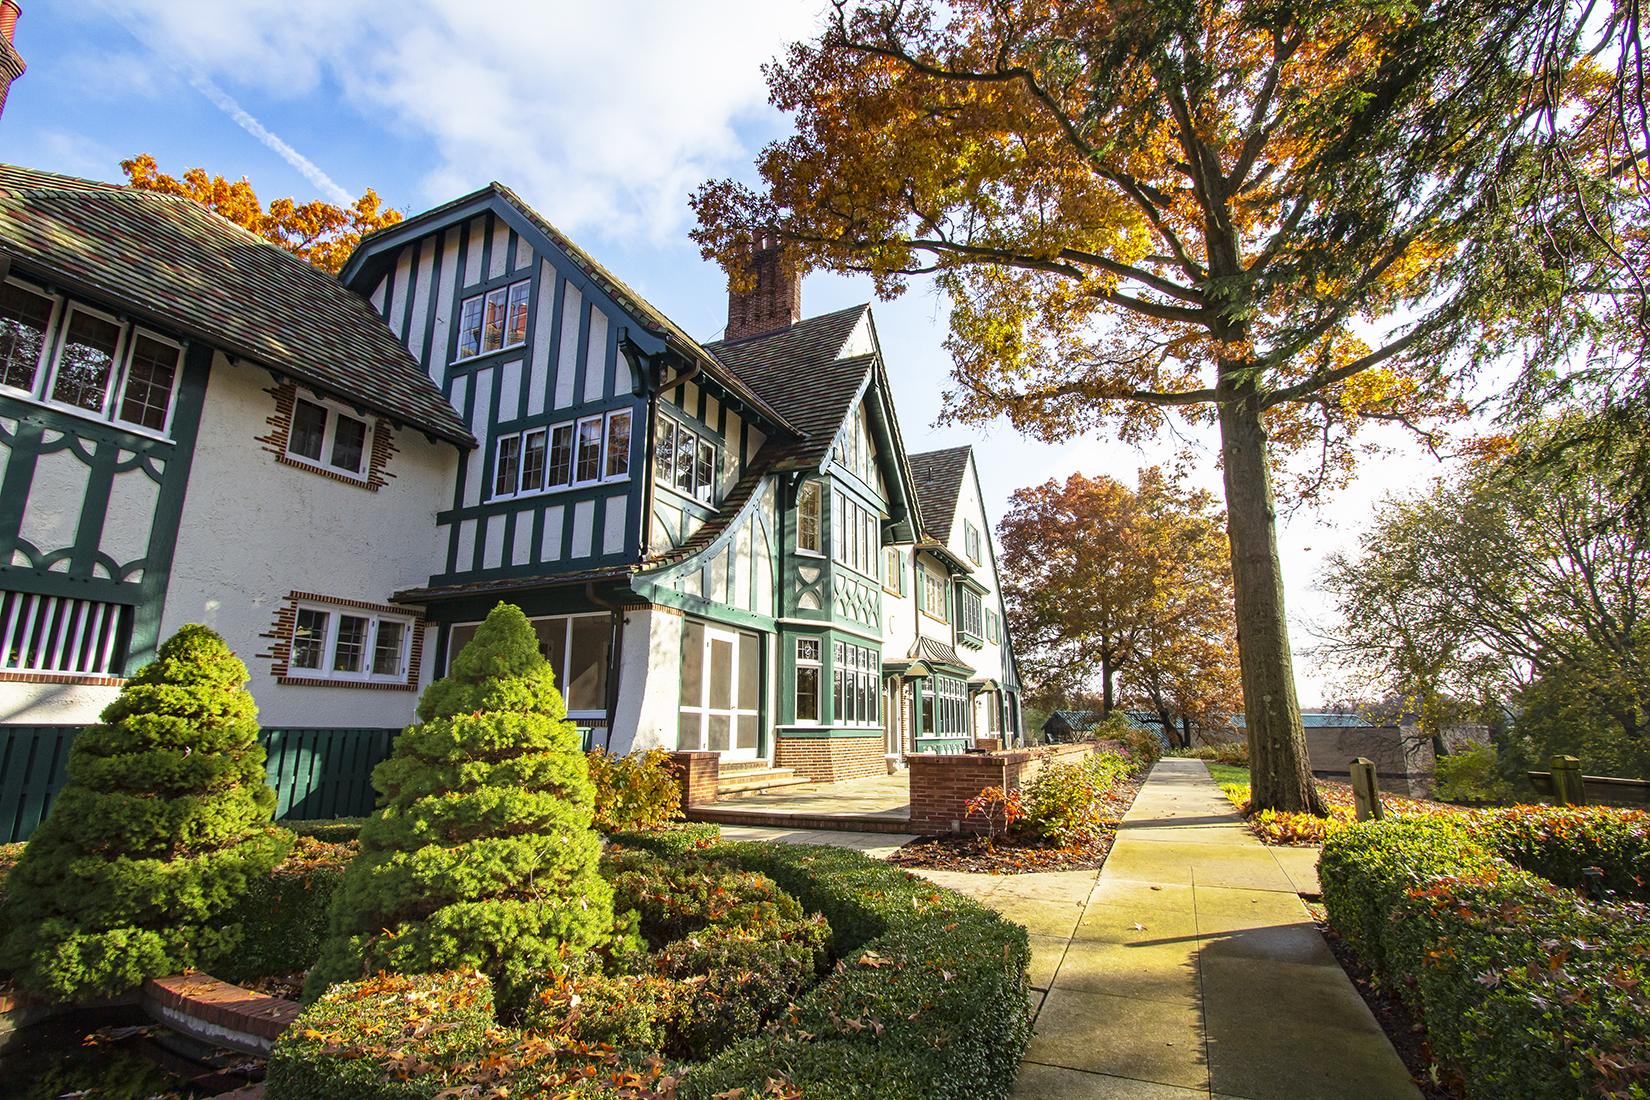 Manor Autumn4 copy